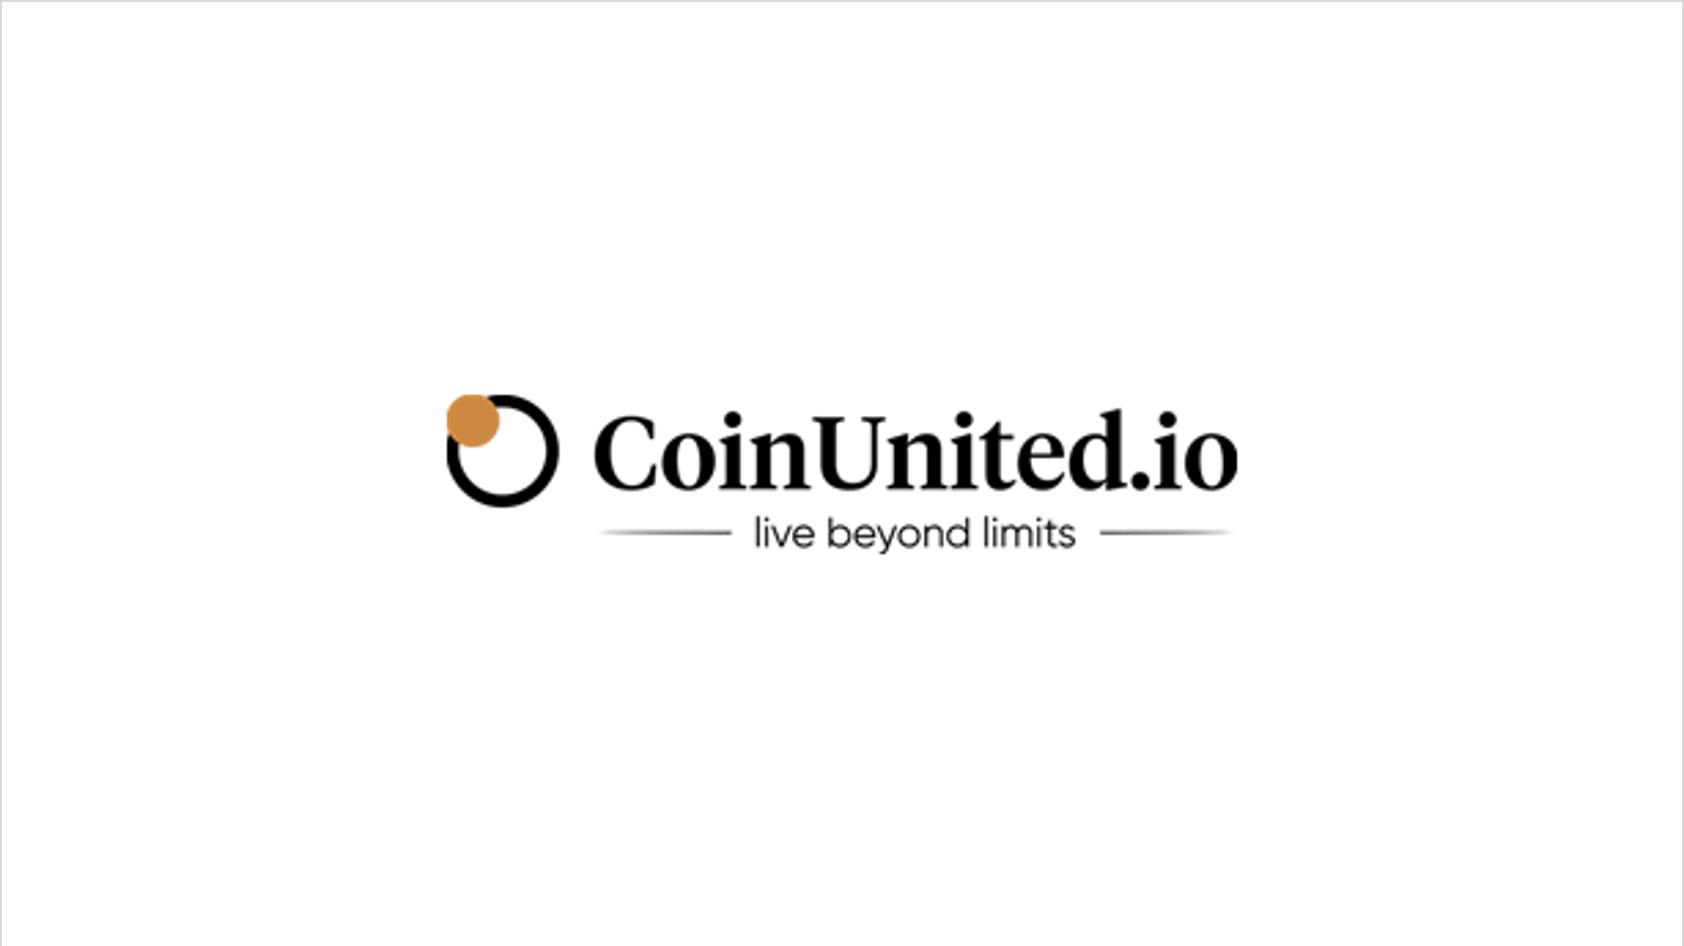 CoinUnited.io (HK)